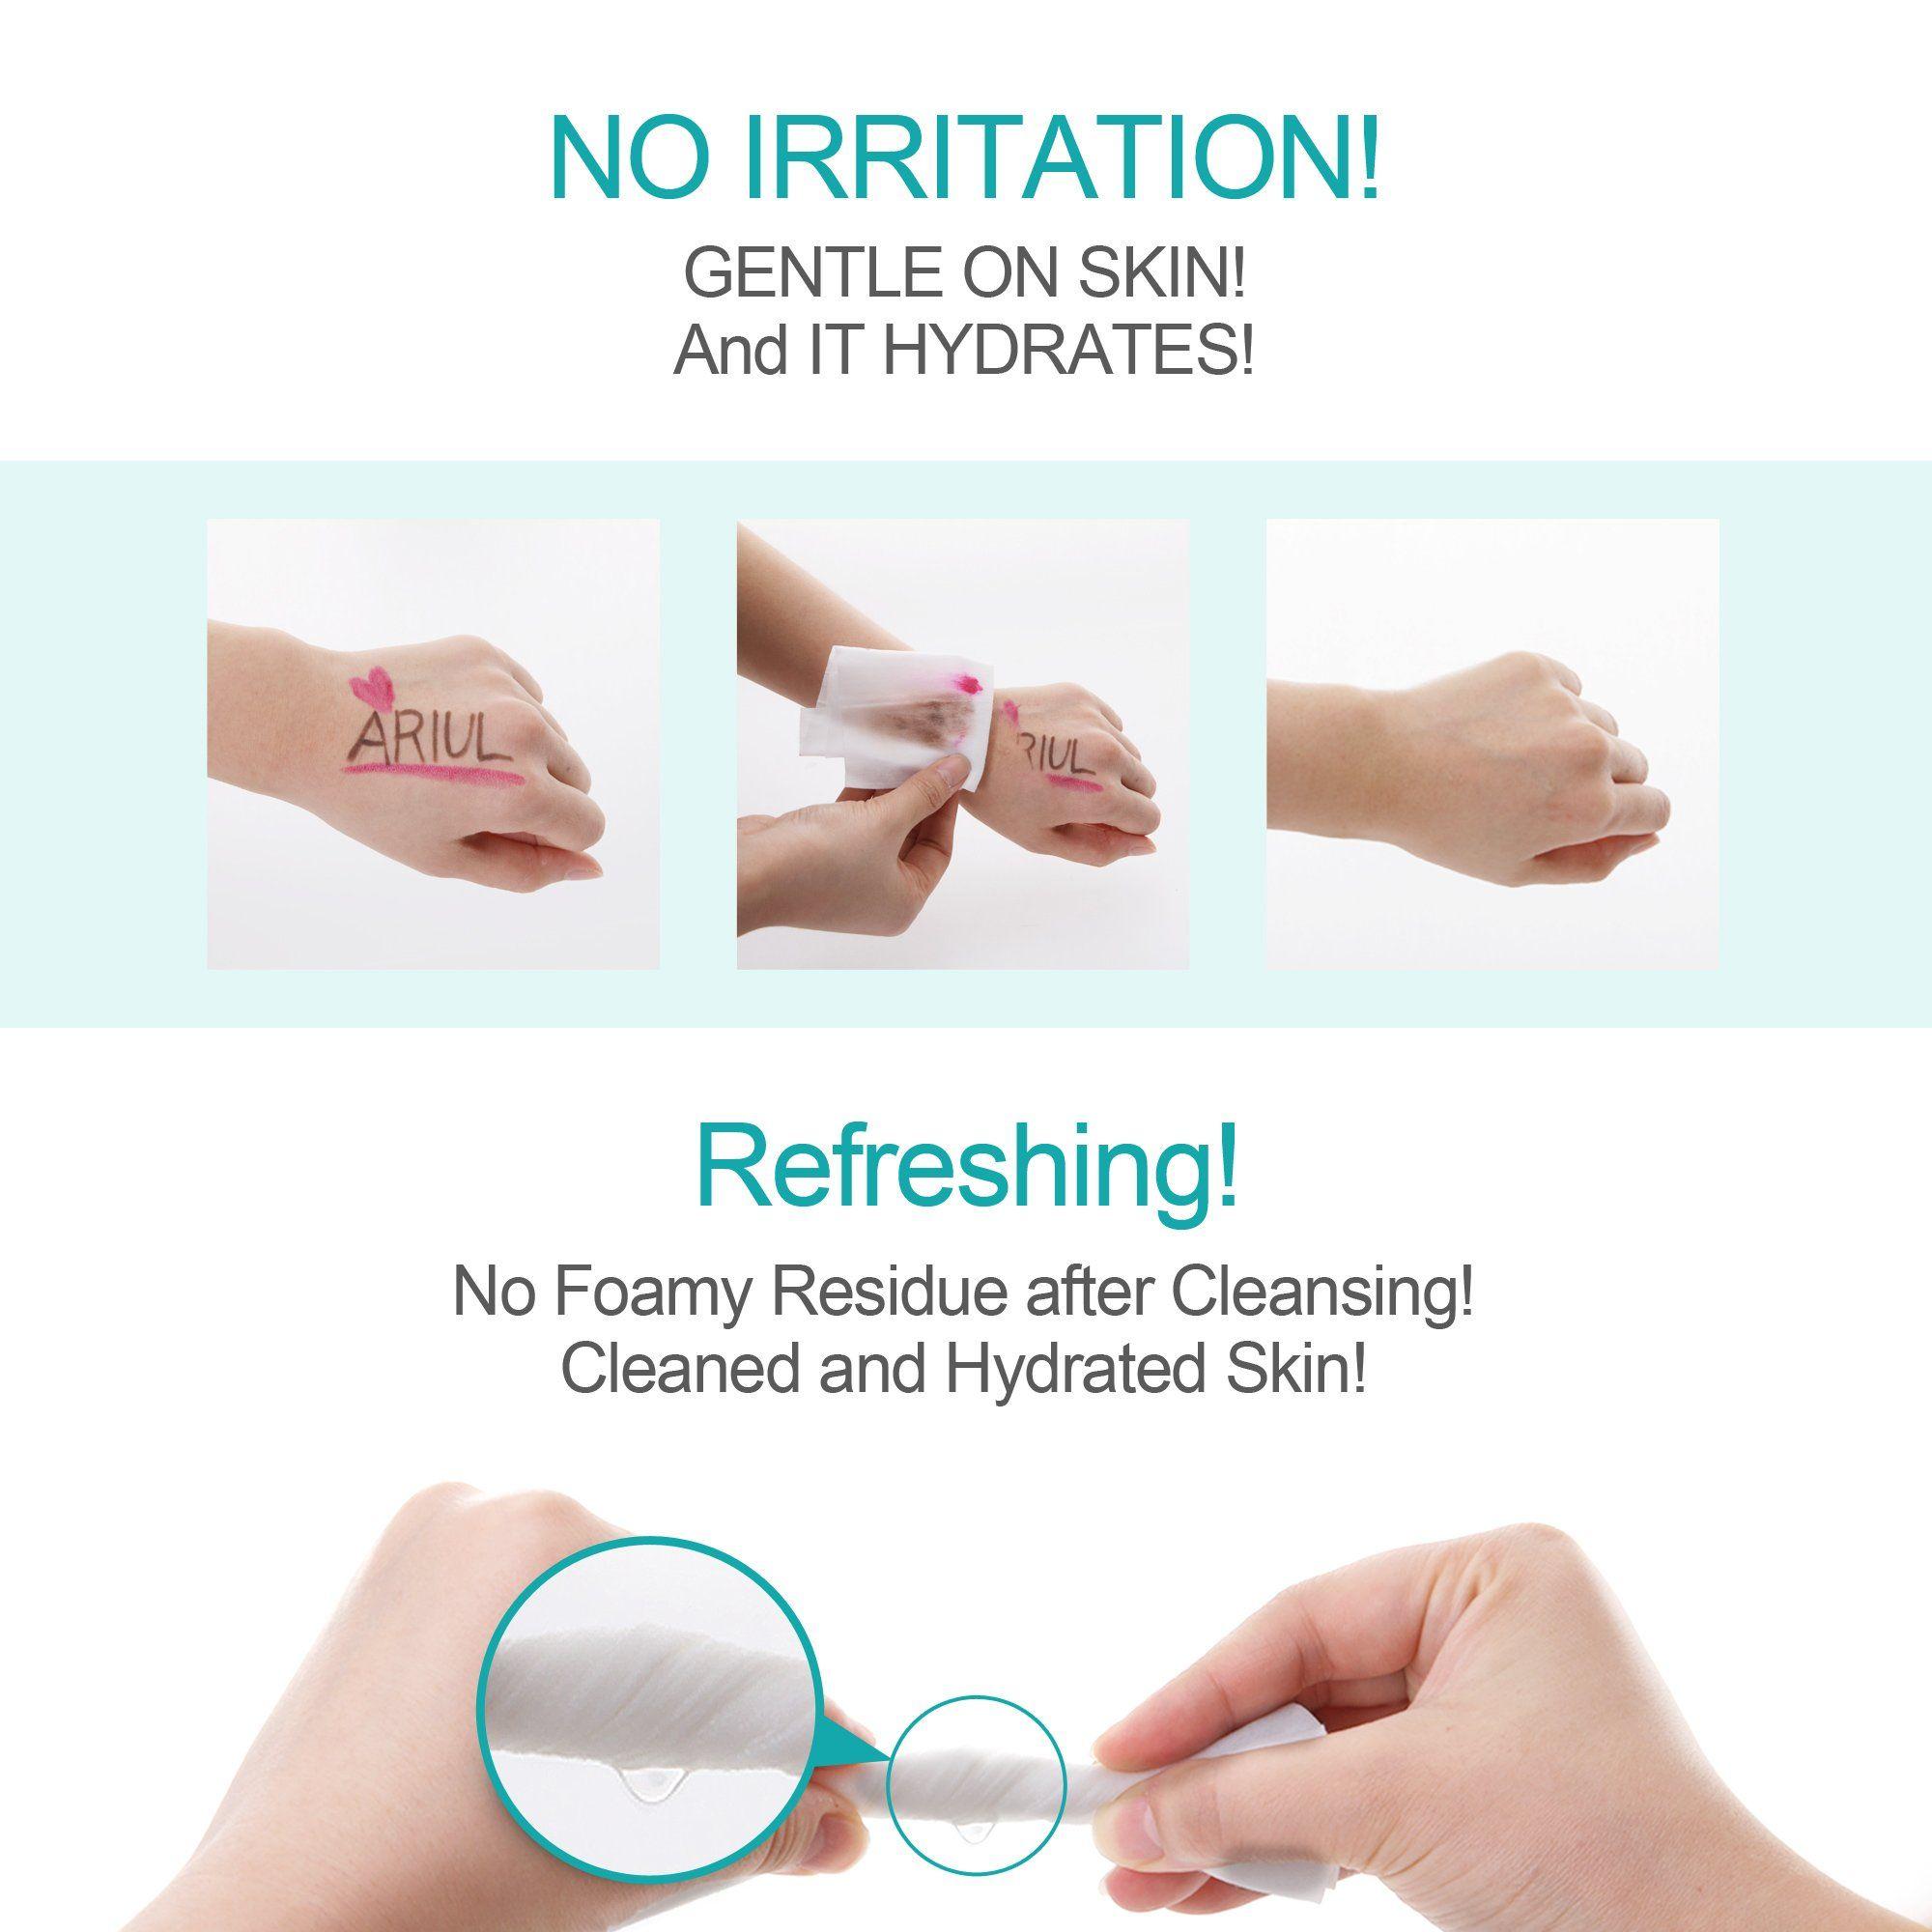 Ariul Stress Relieving Purefull Cleansing Tissue Makeup